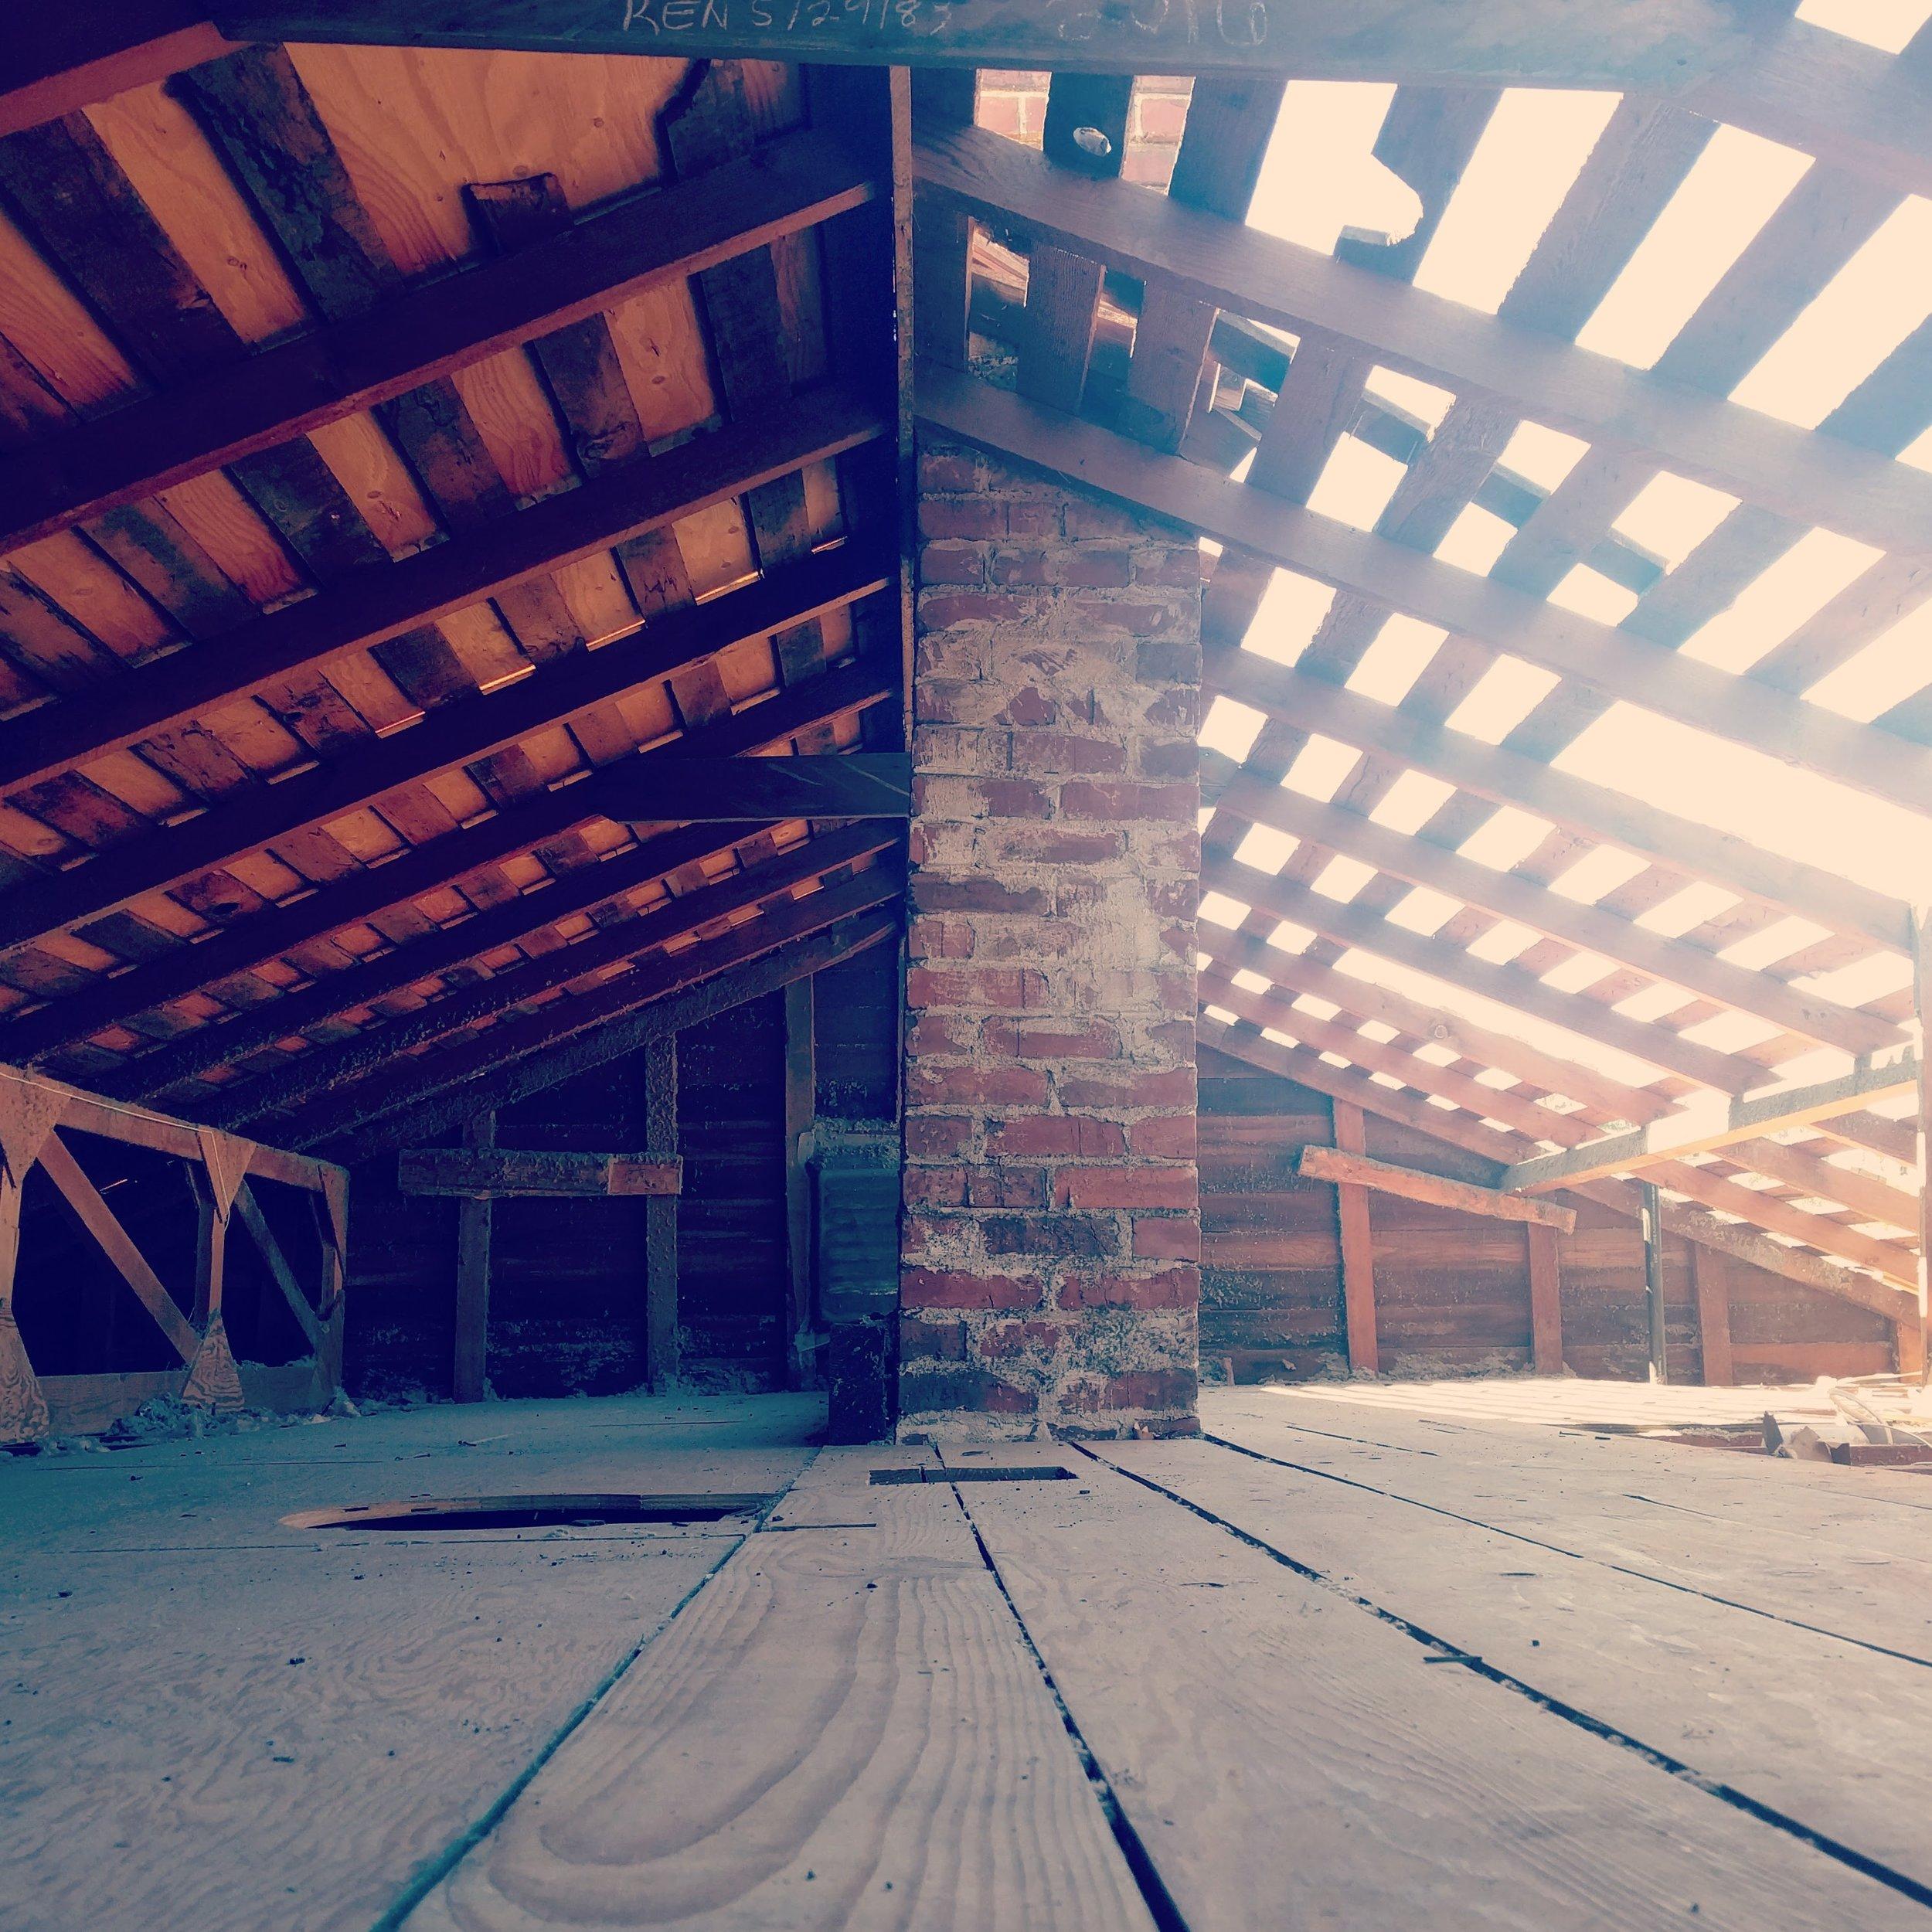 Roof replacement & rafter repair